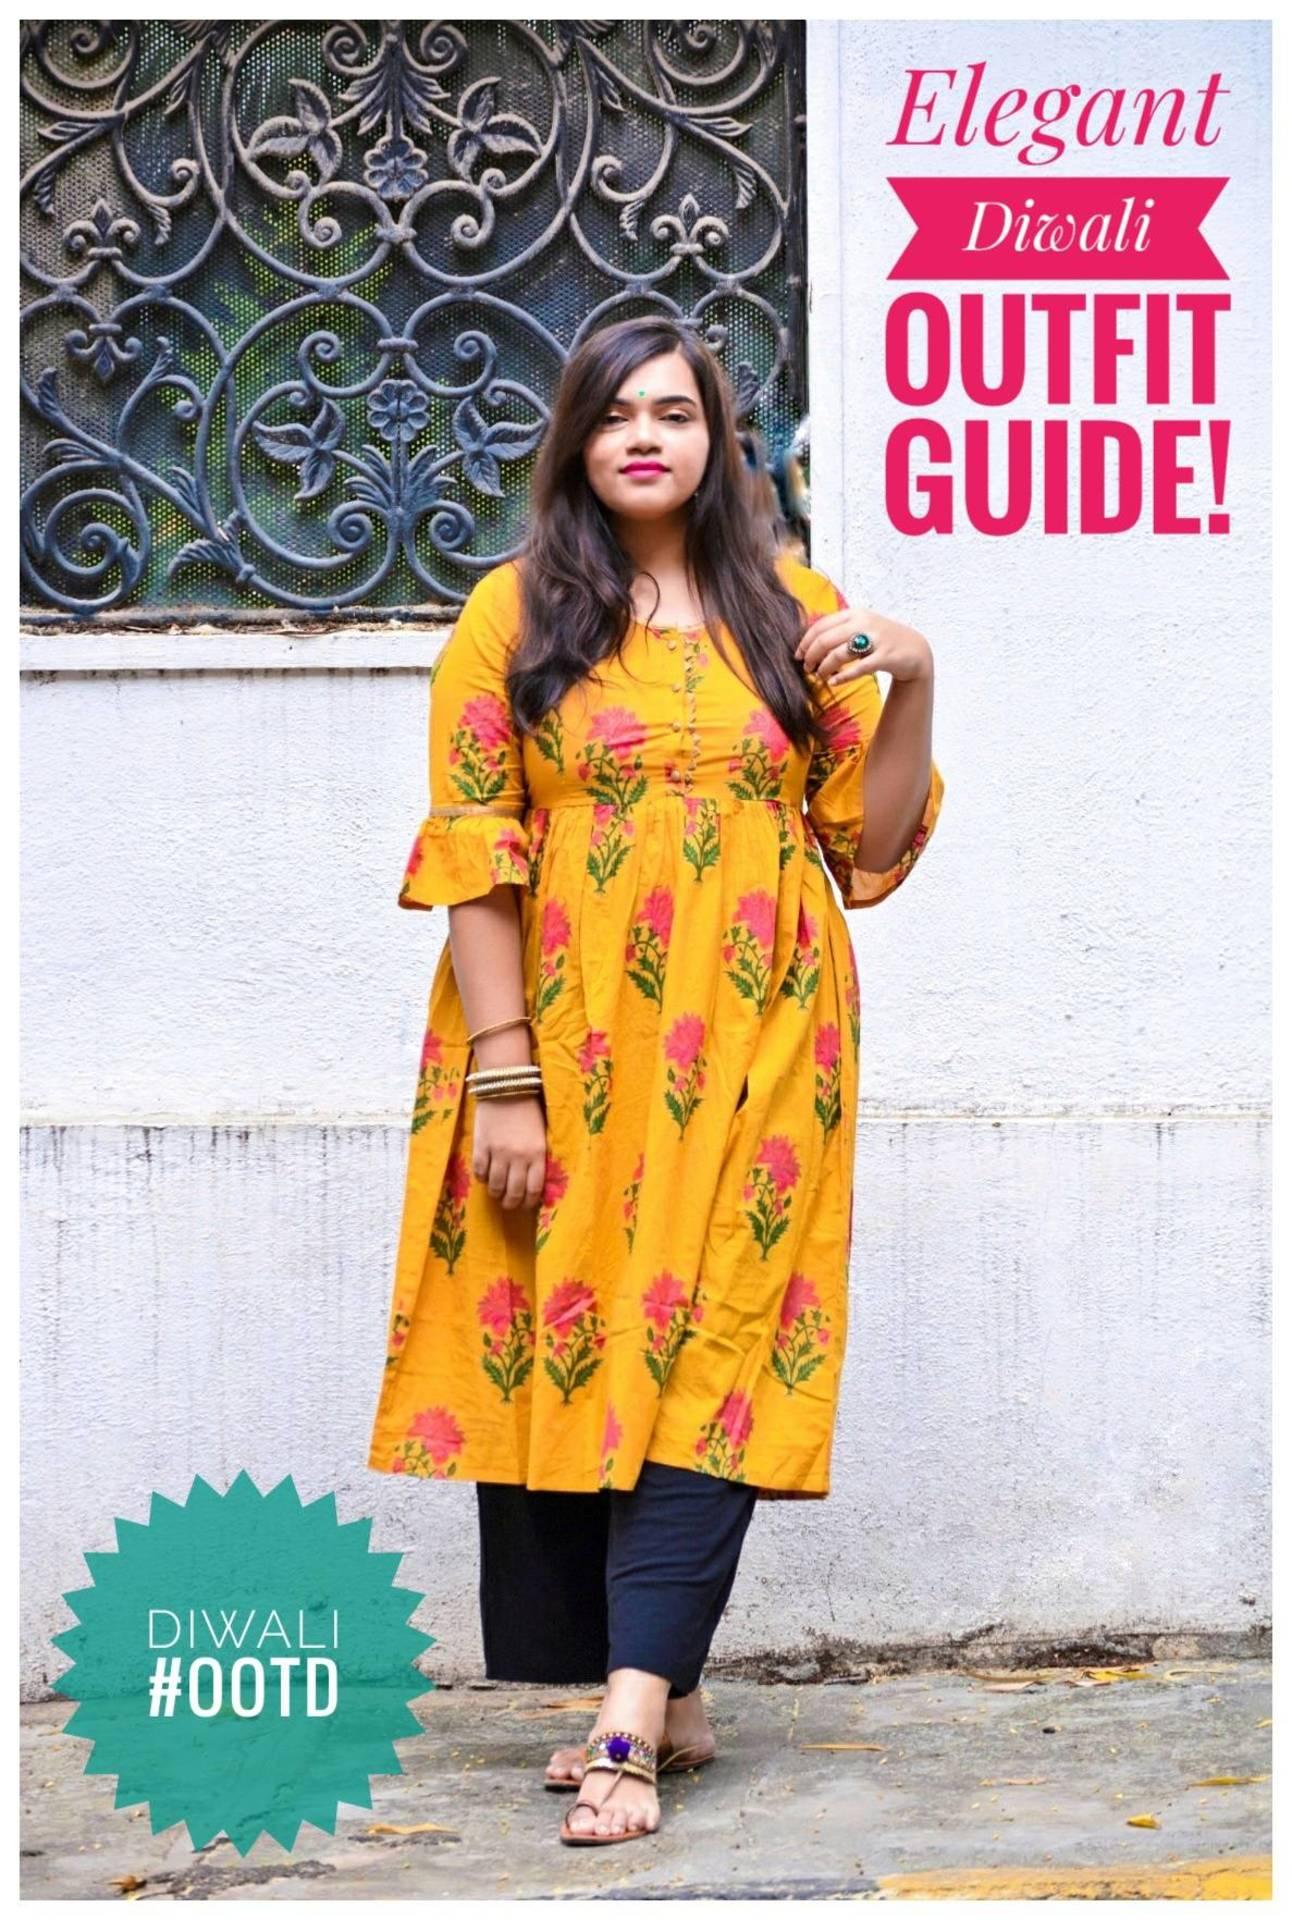 Elegant Diwali Outfit Guide! image